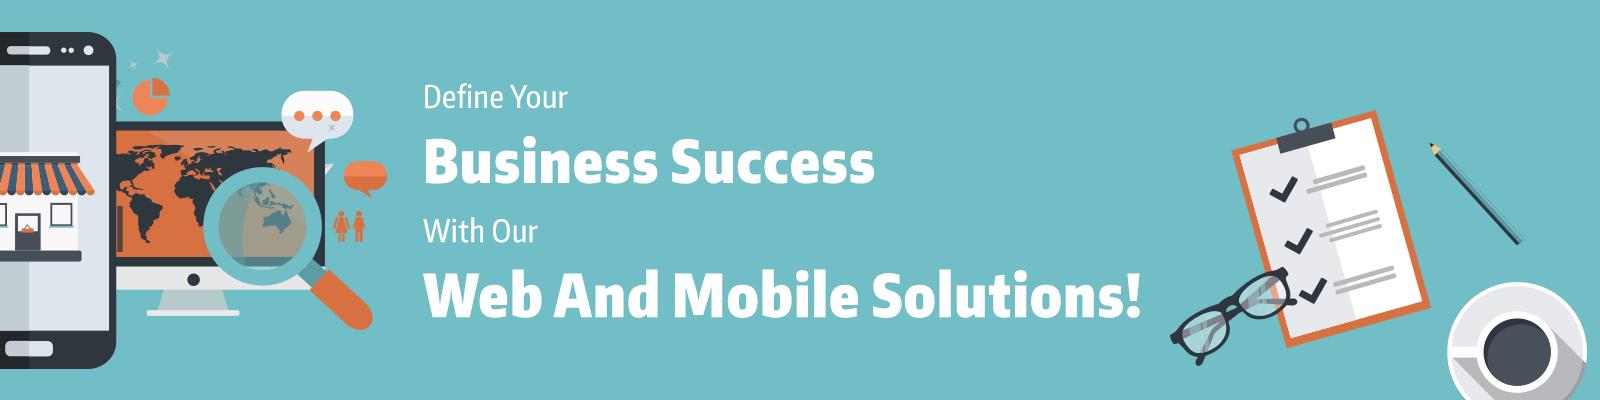 mobile app development company texas